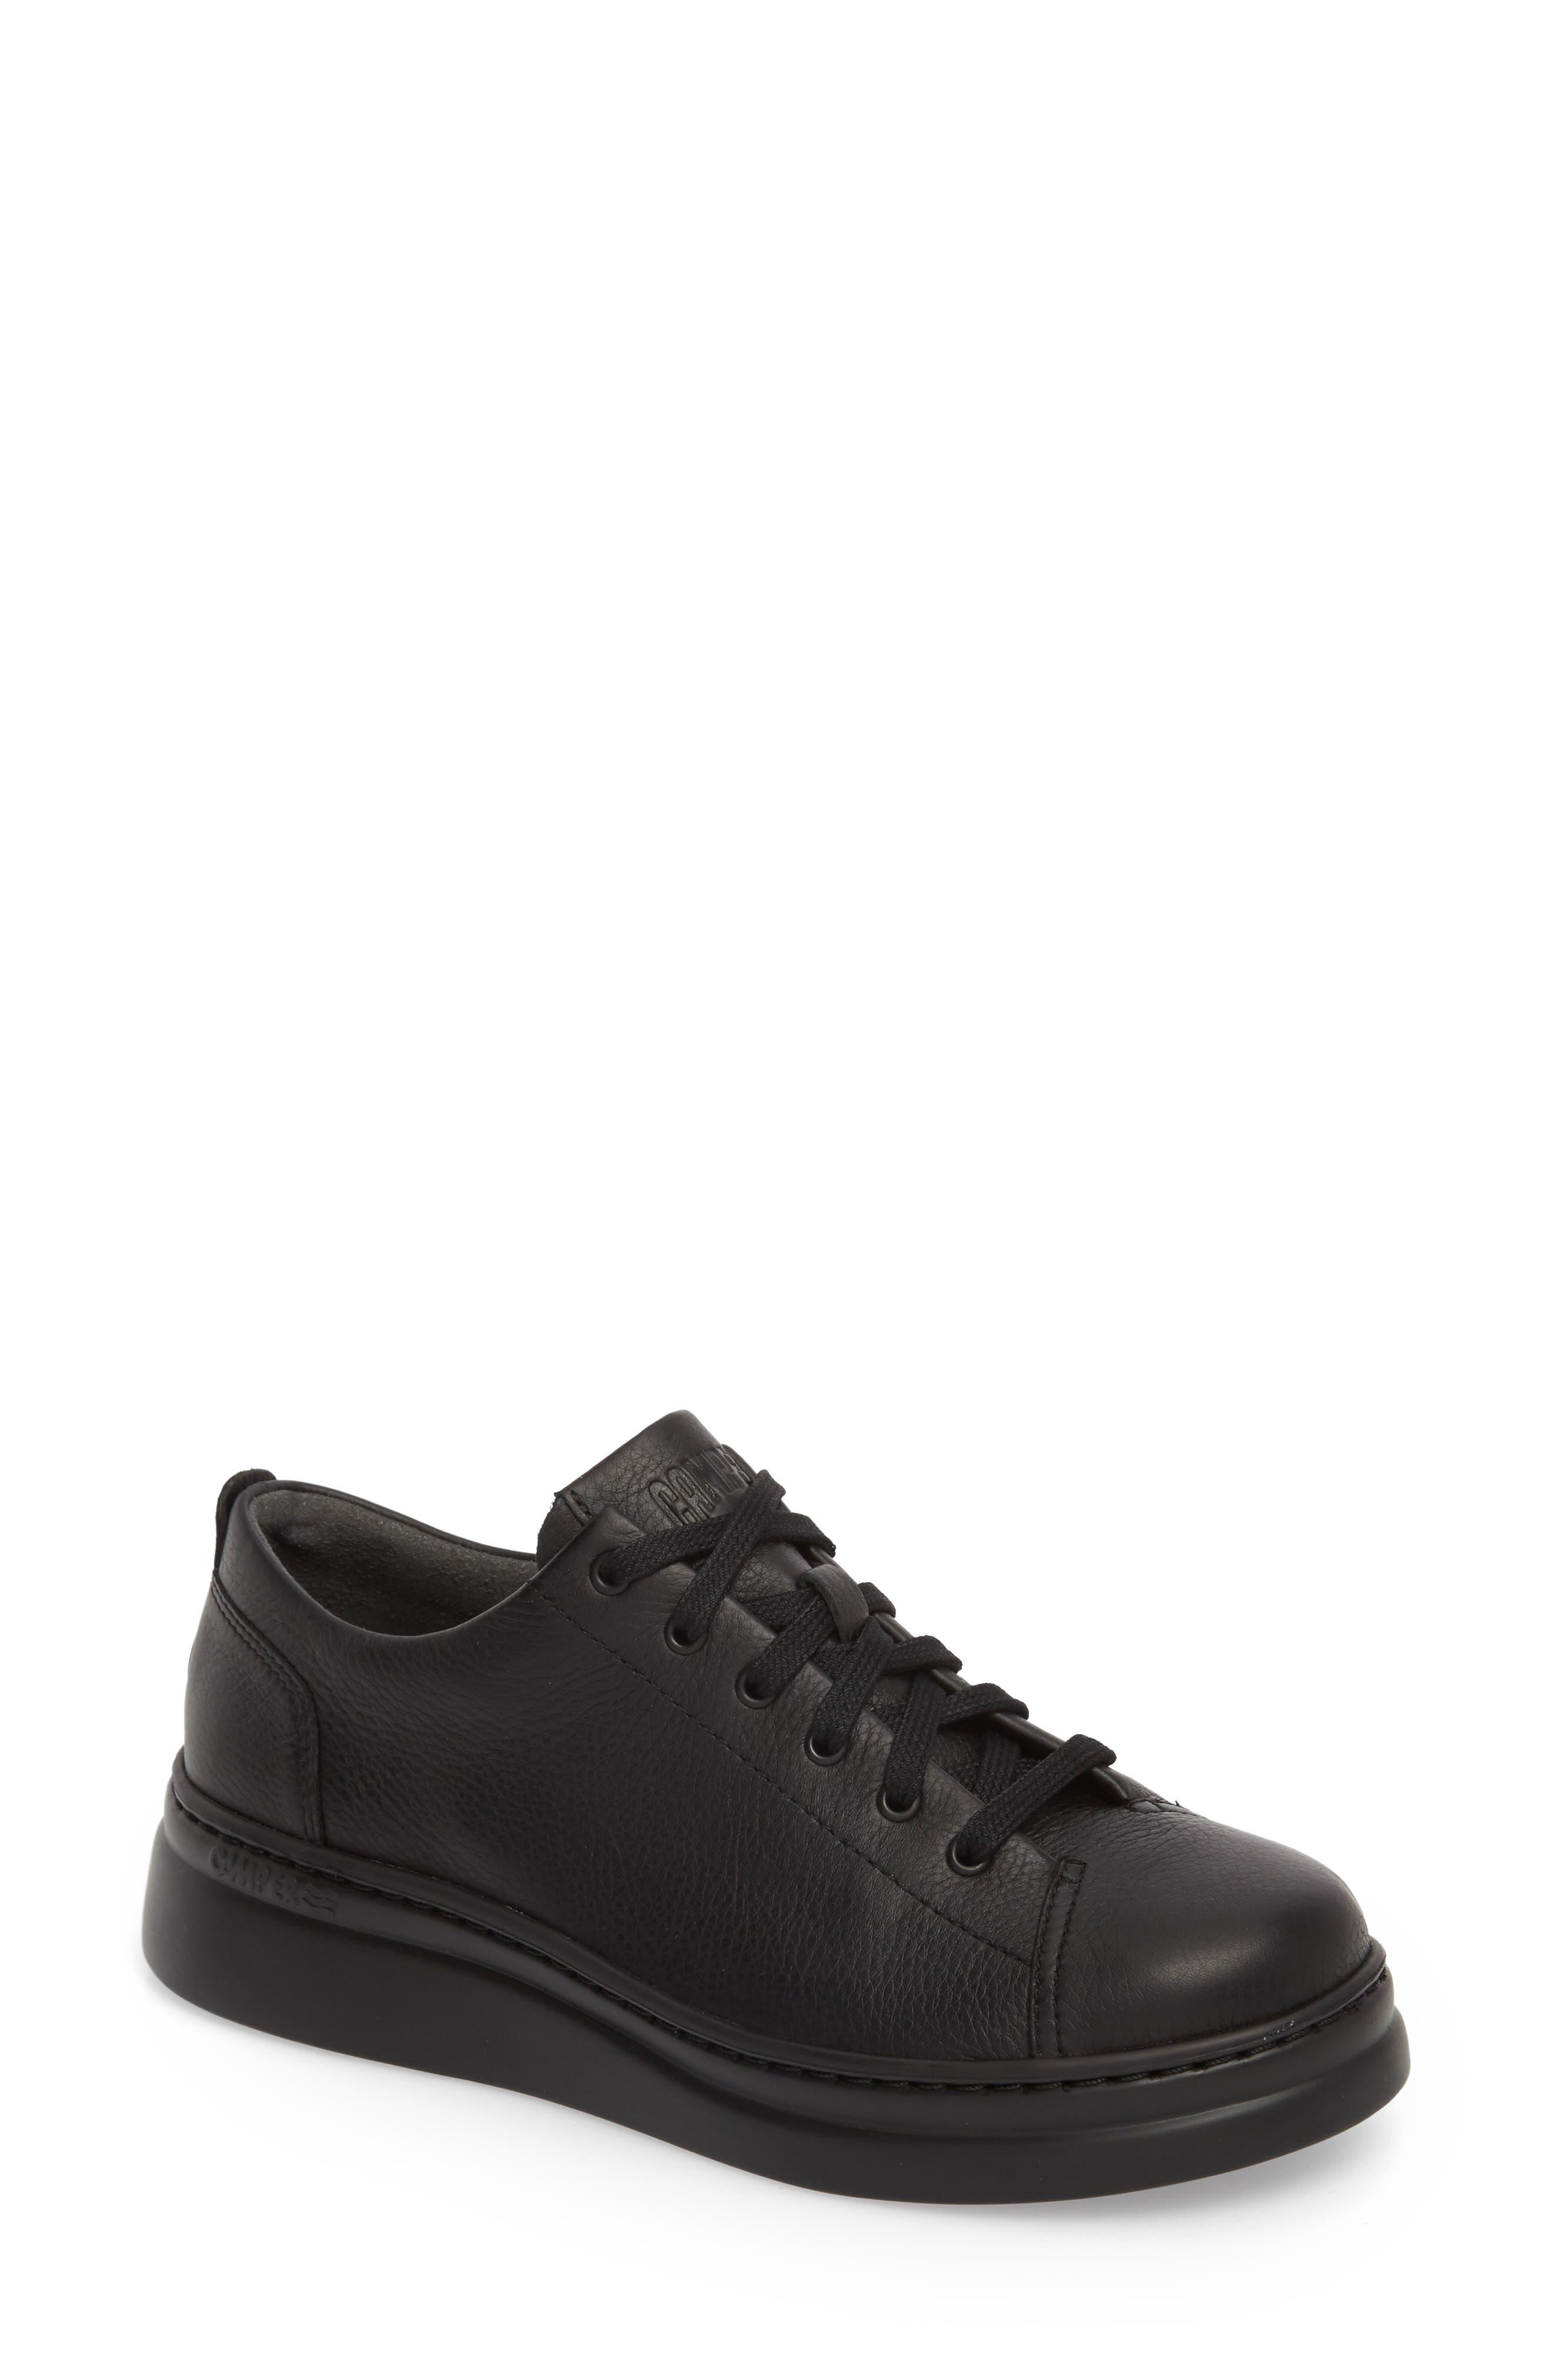 Runner Up Sneaker,                         Main,                         color, BLACK LEATHER